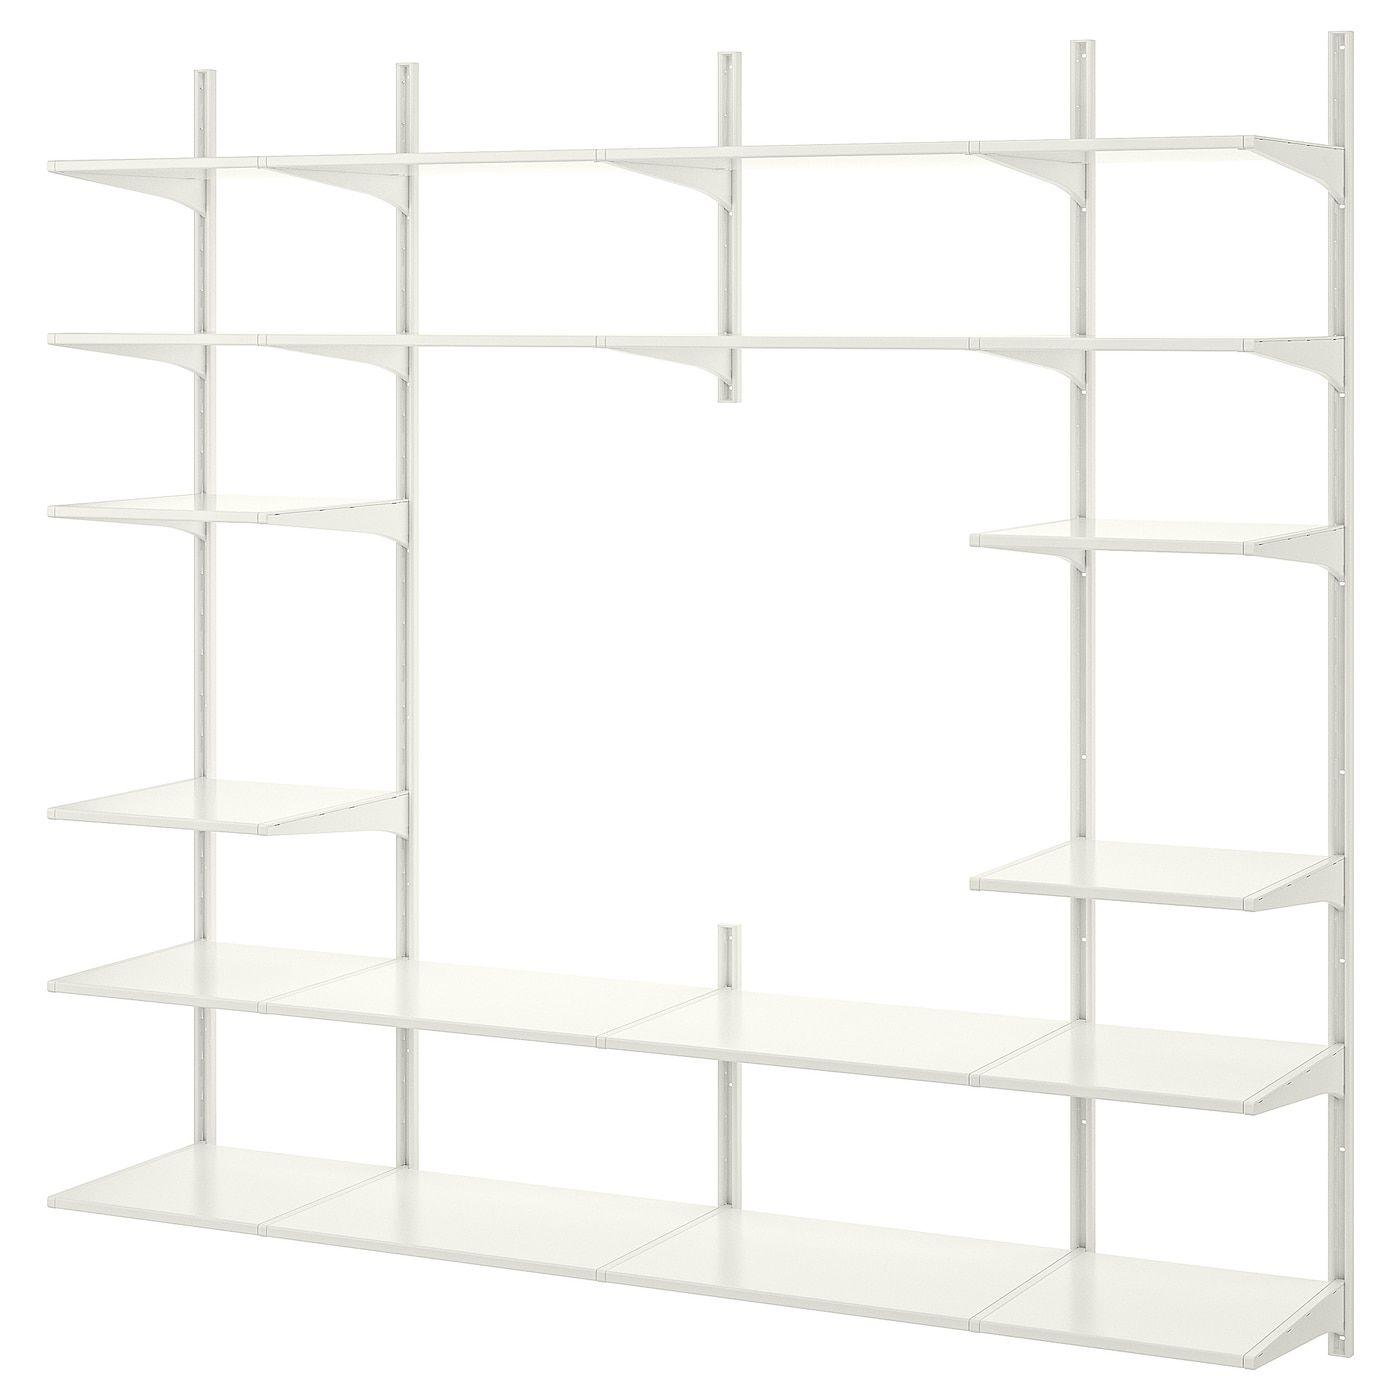 ALGOT Wall uprightshelves white